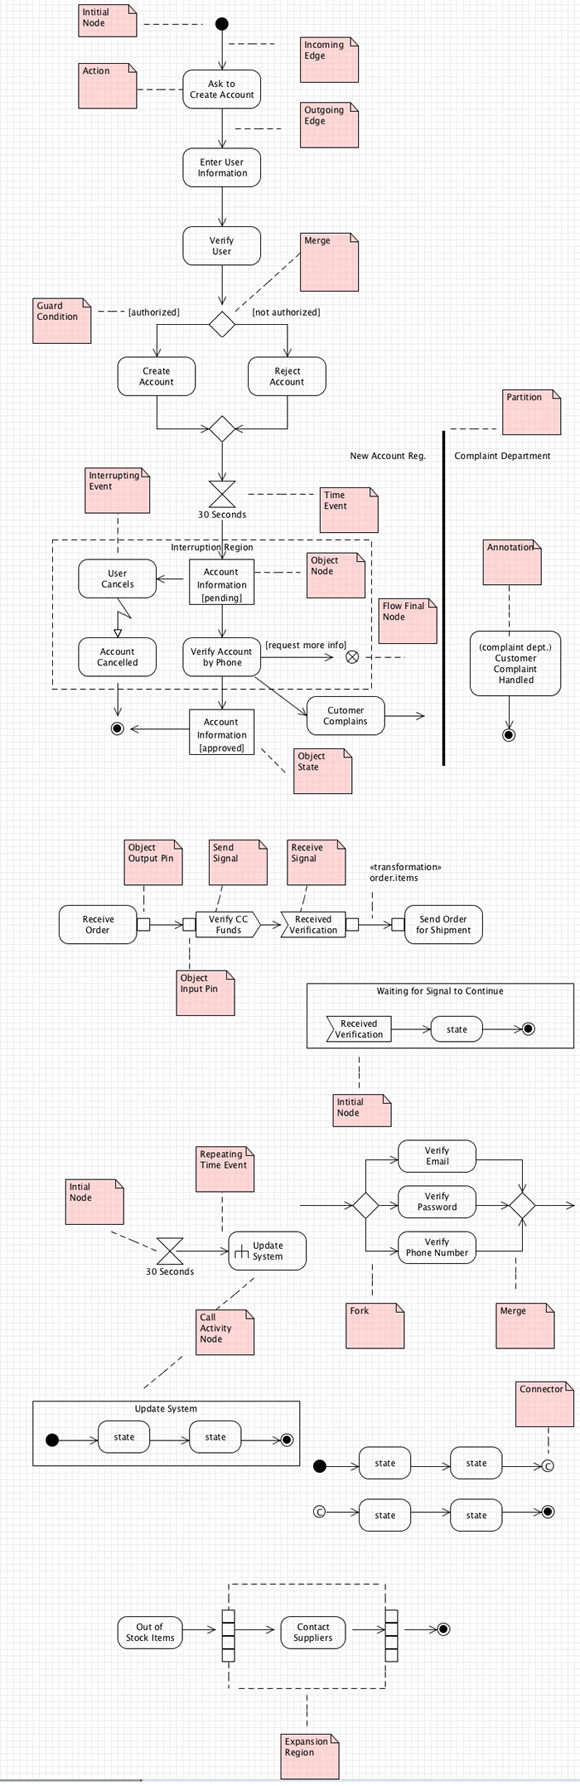 medium resolution of android activity activity diagram control flow use case flowchart software development